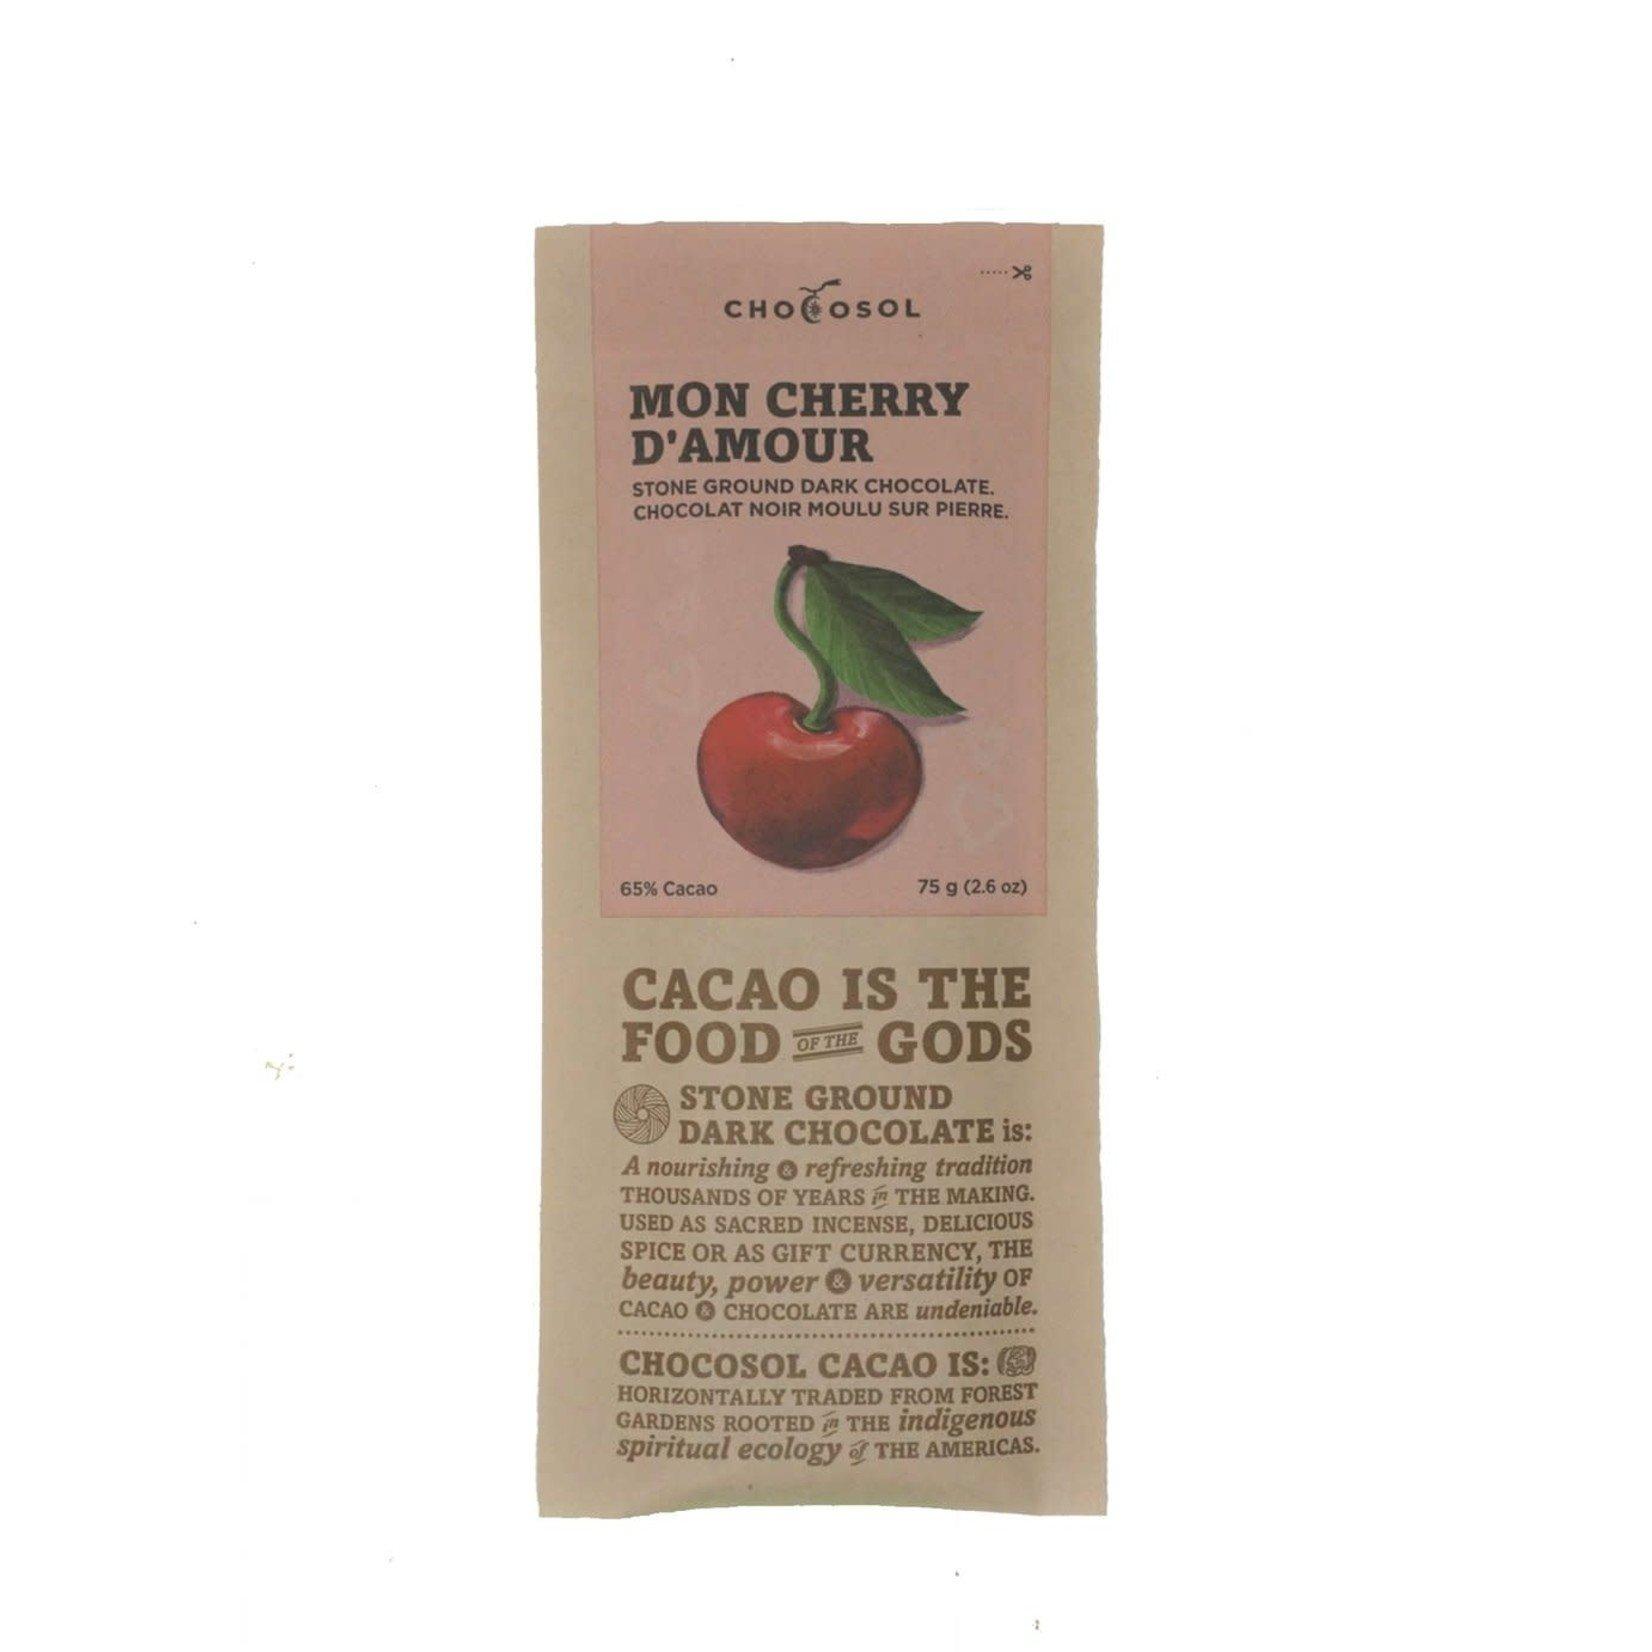 Chocosol Mon Cherry D'amour